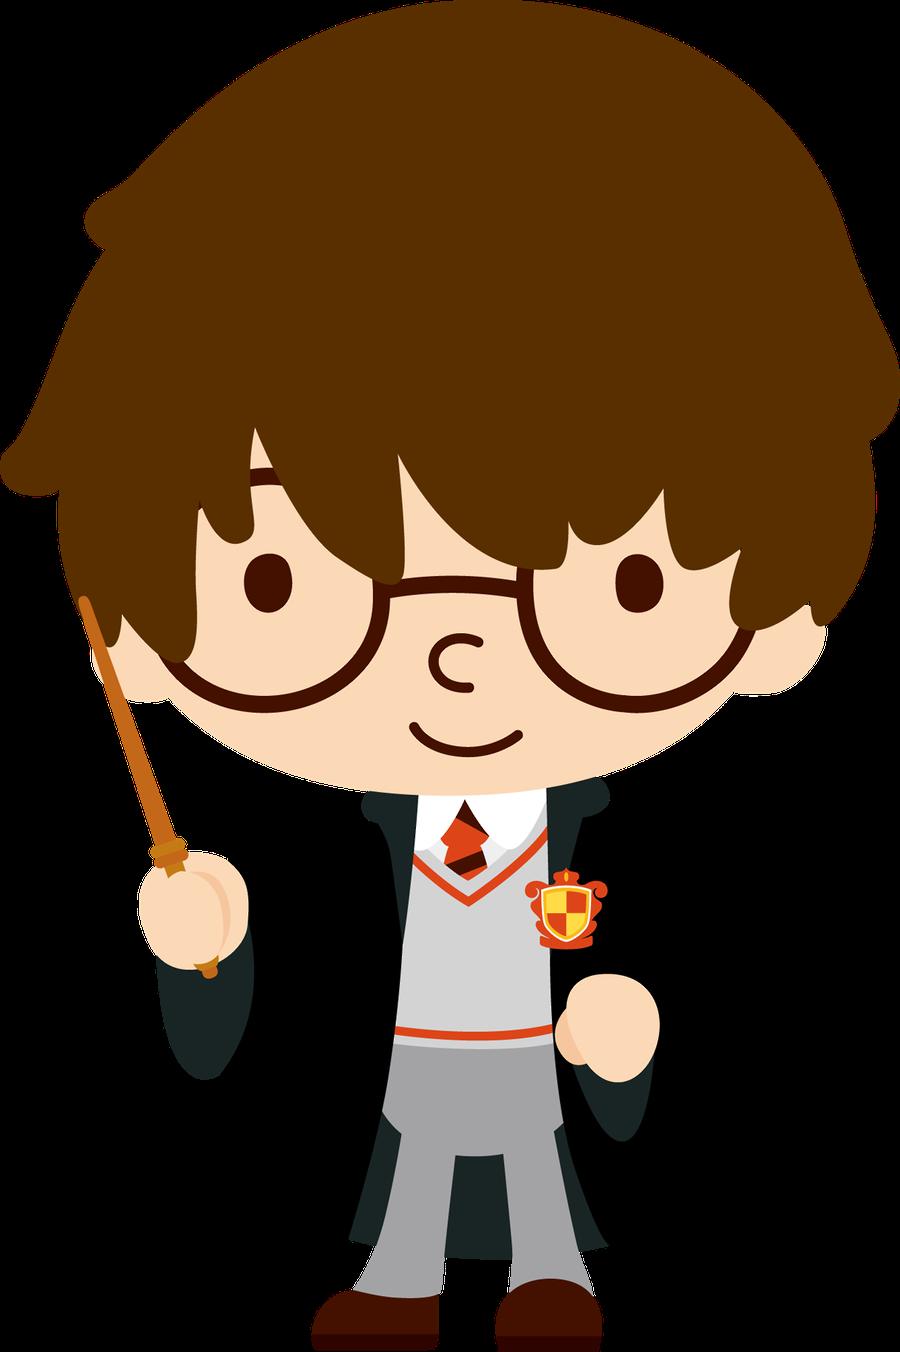 900x1352 Harry Potter